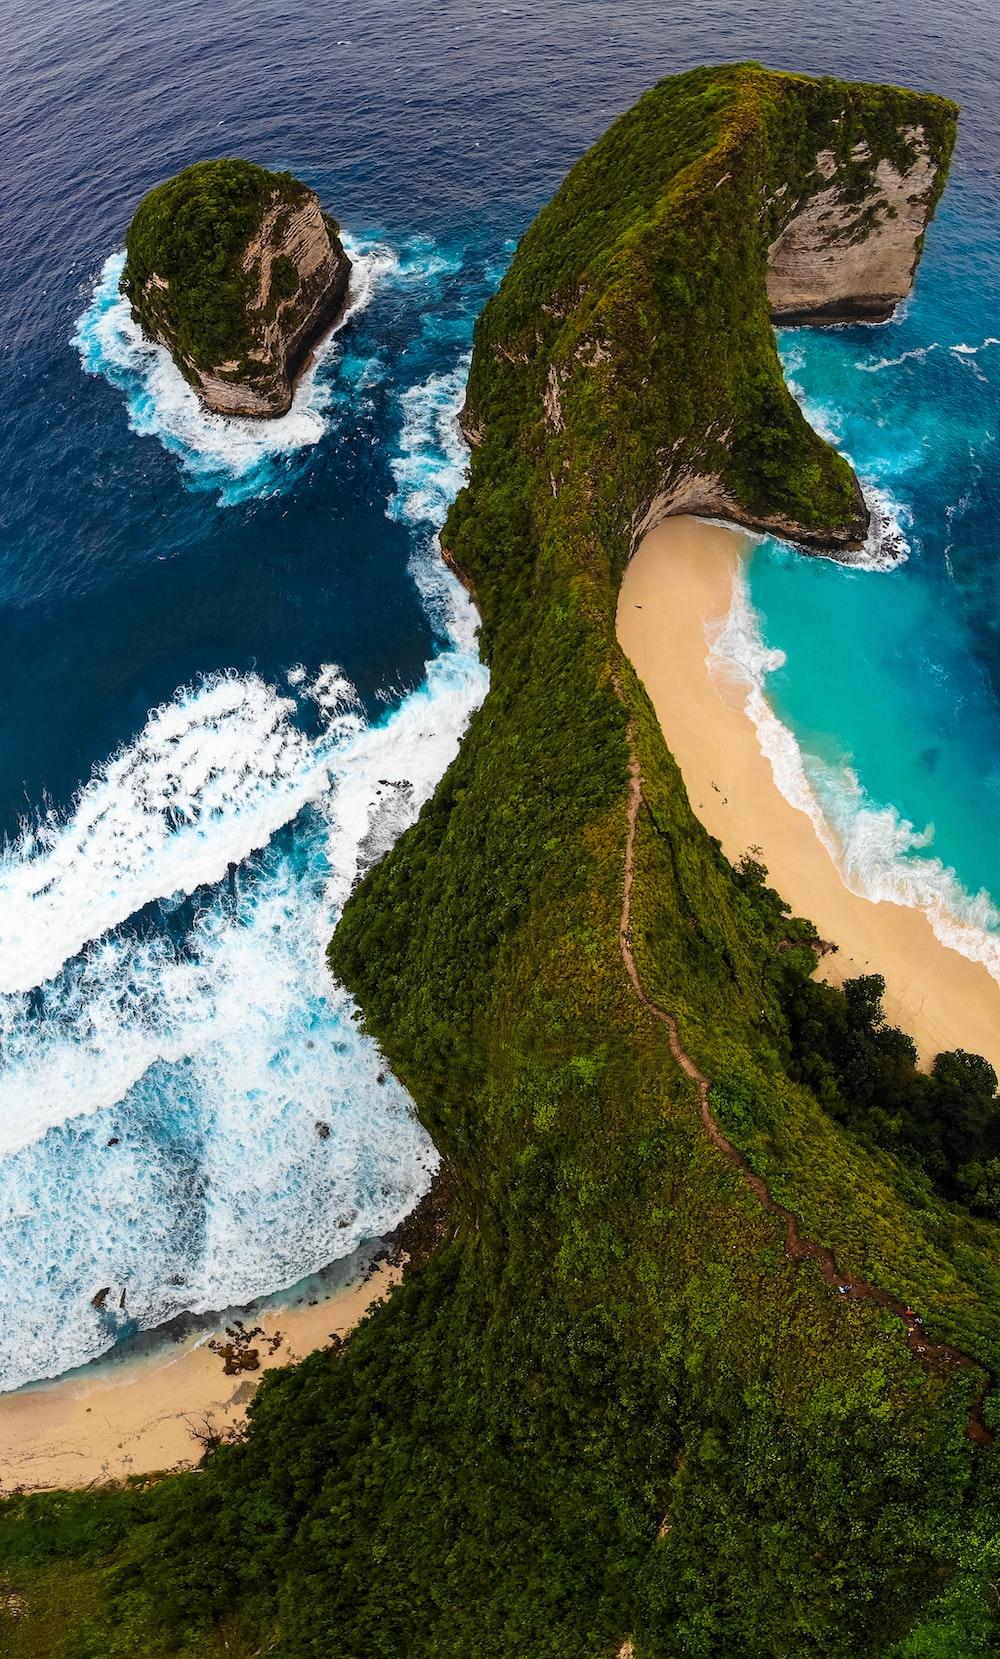 green island in high-angle photo